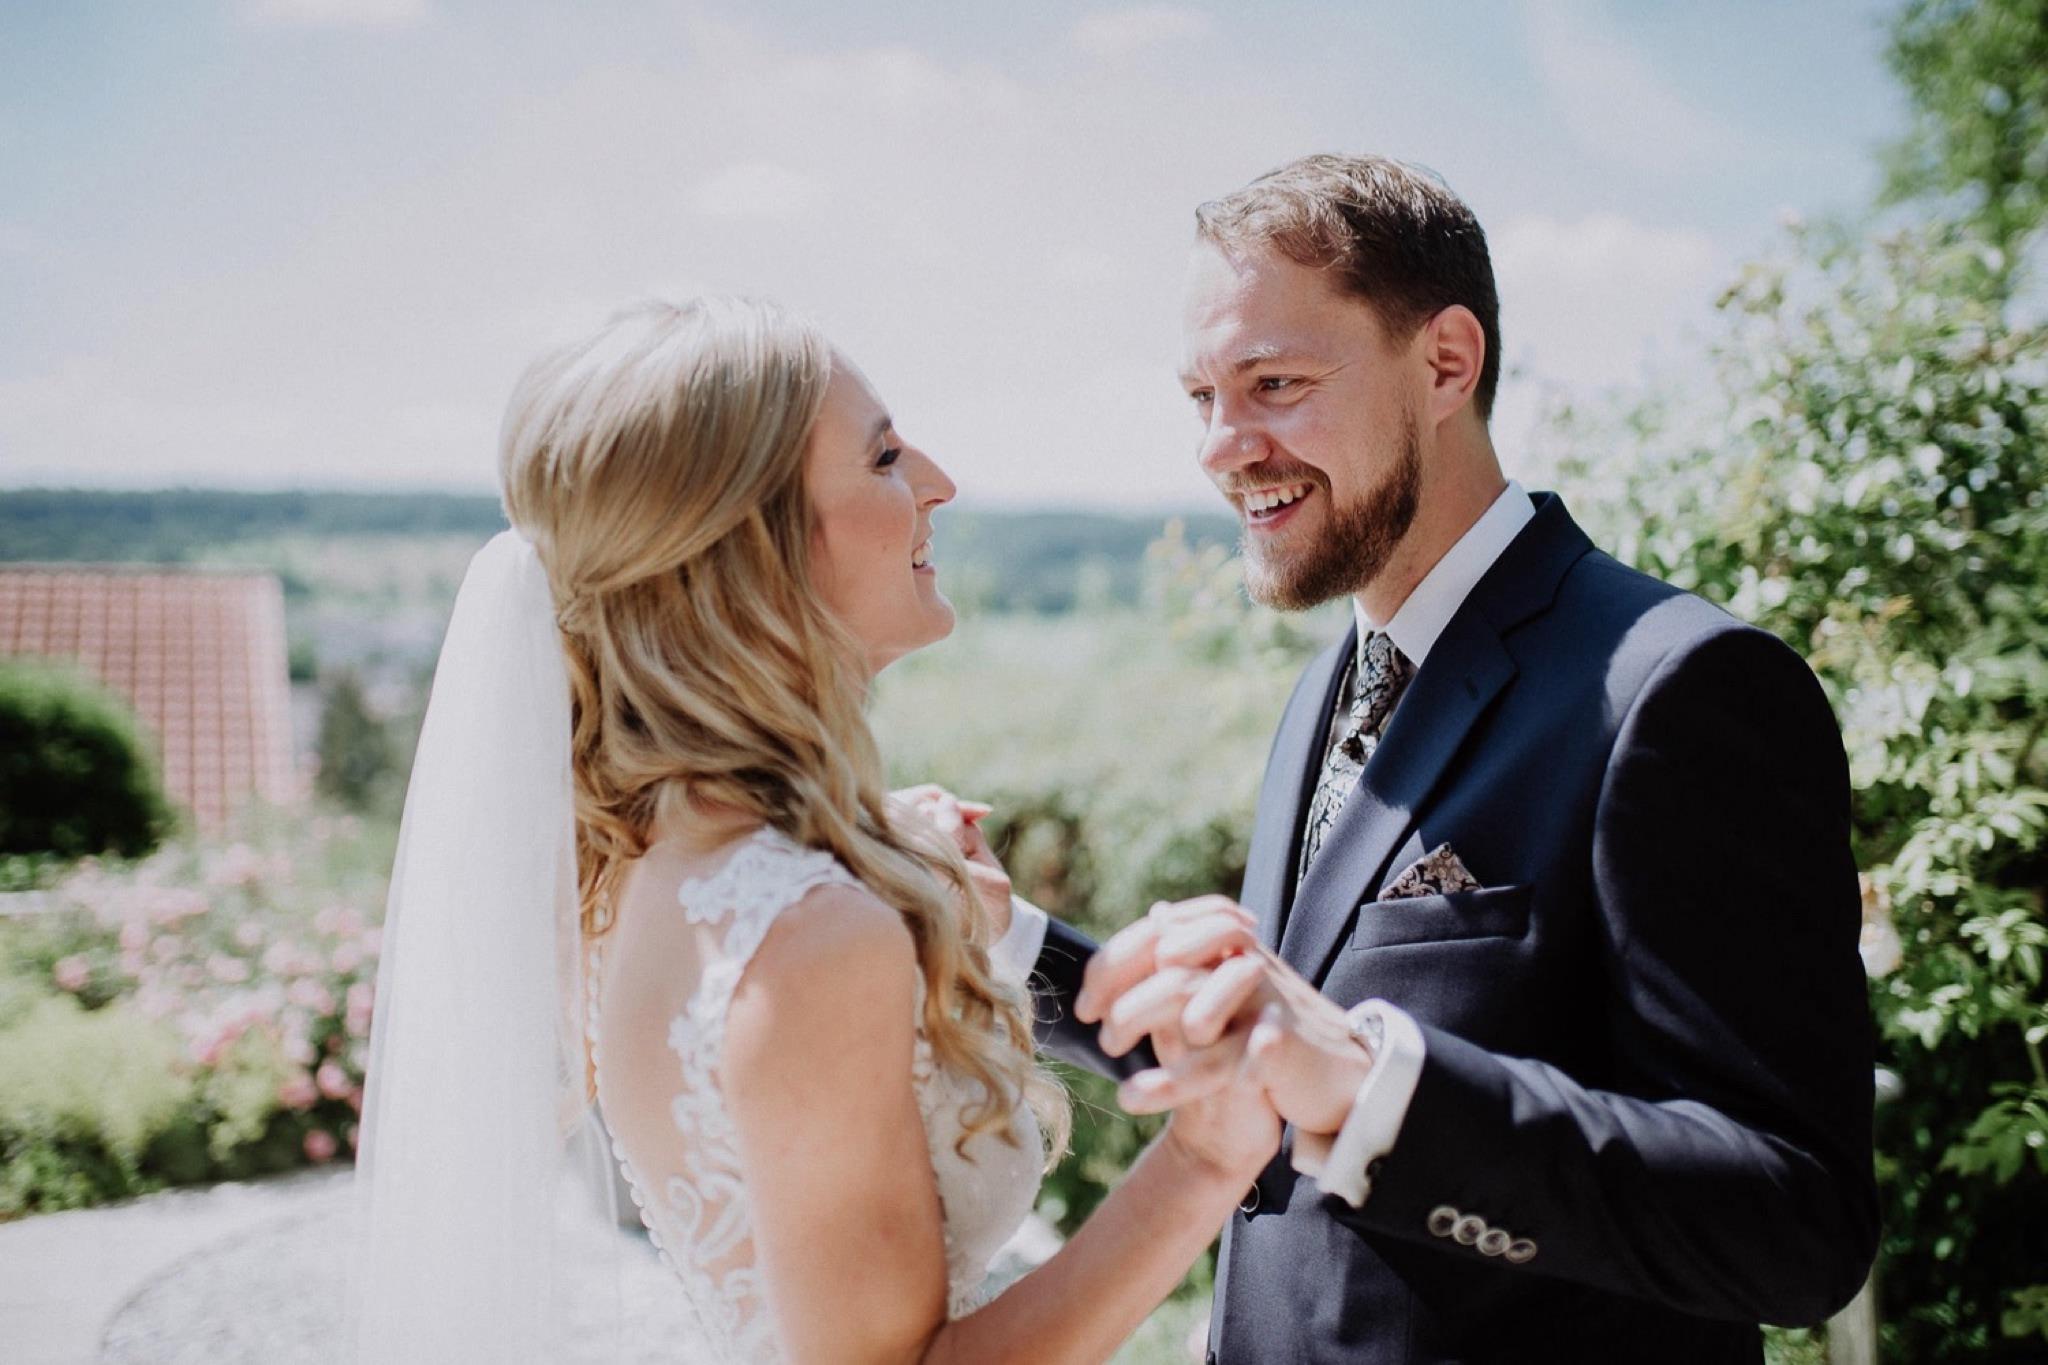 wedding photographer hamilton new zealand 1009 2